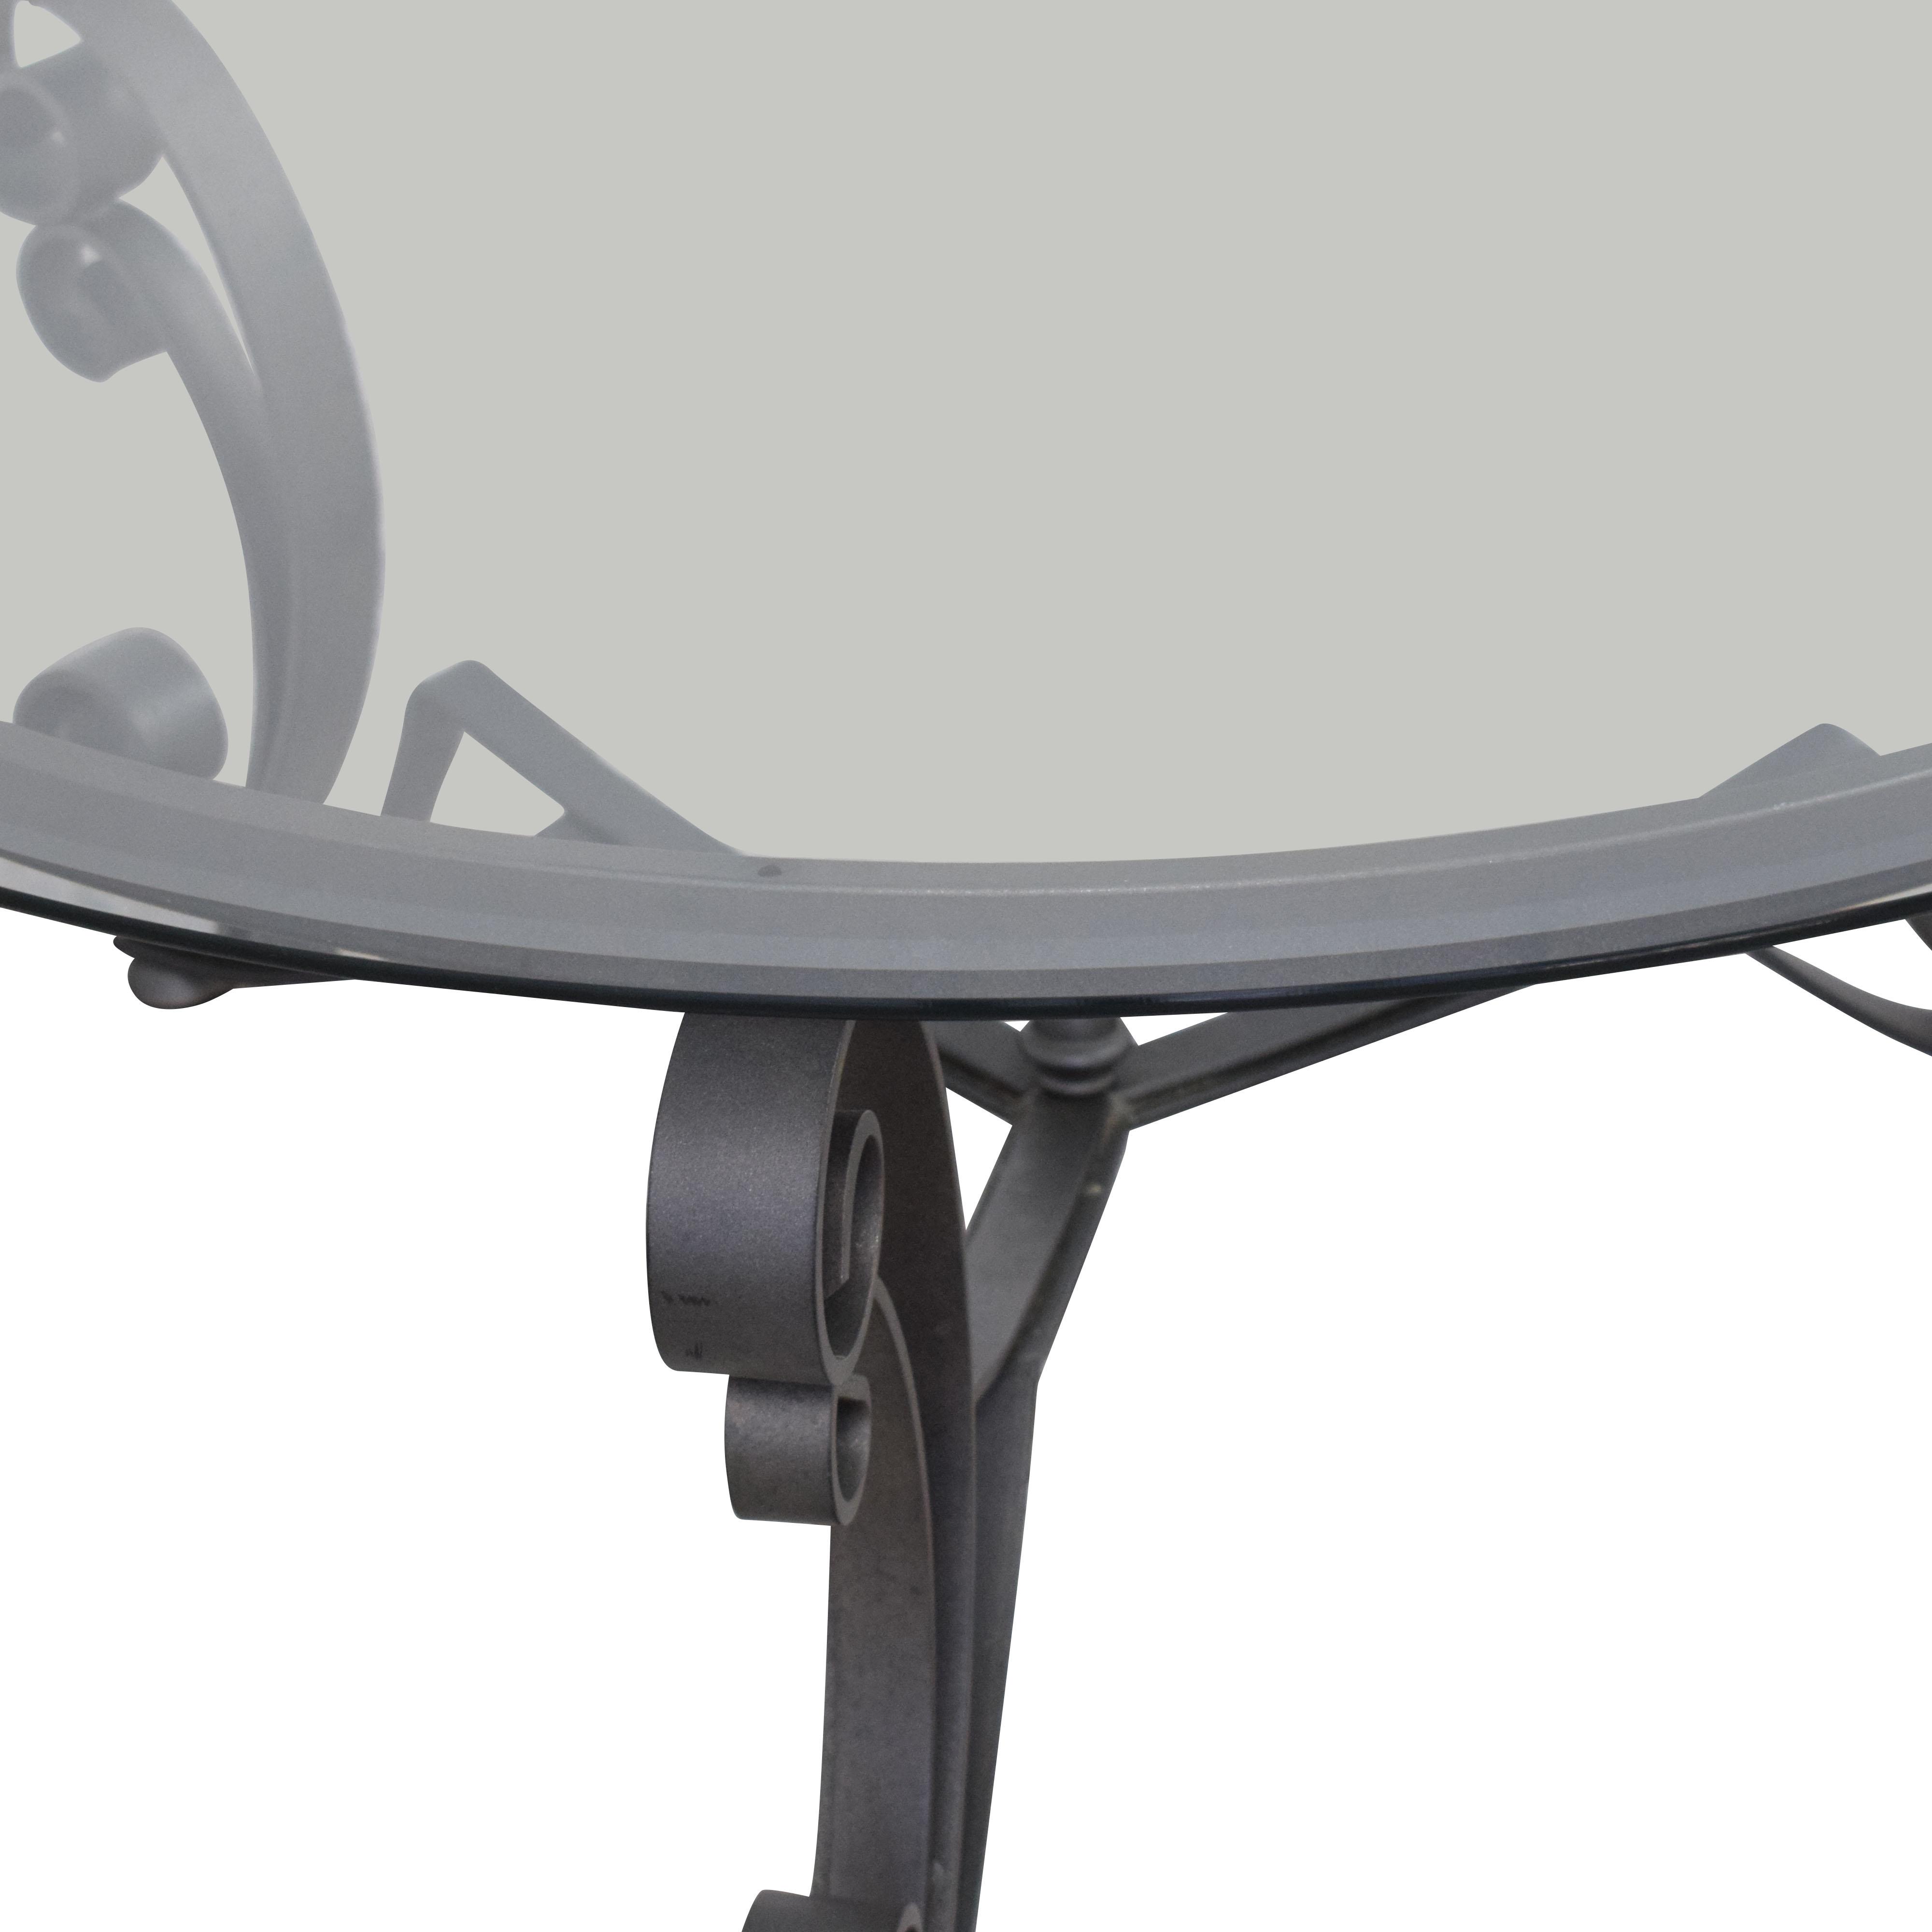 Bloomingdale's Art Deco Style Coffee Table on sale